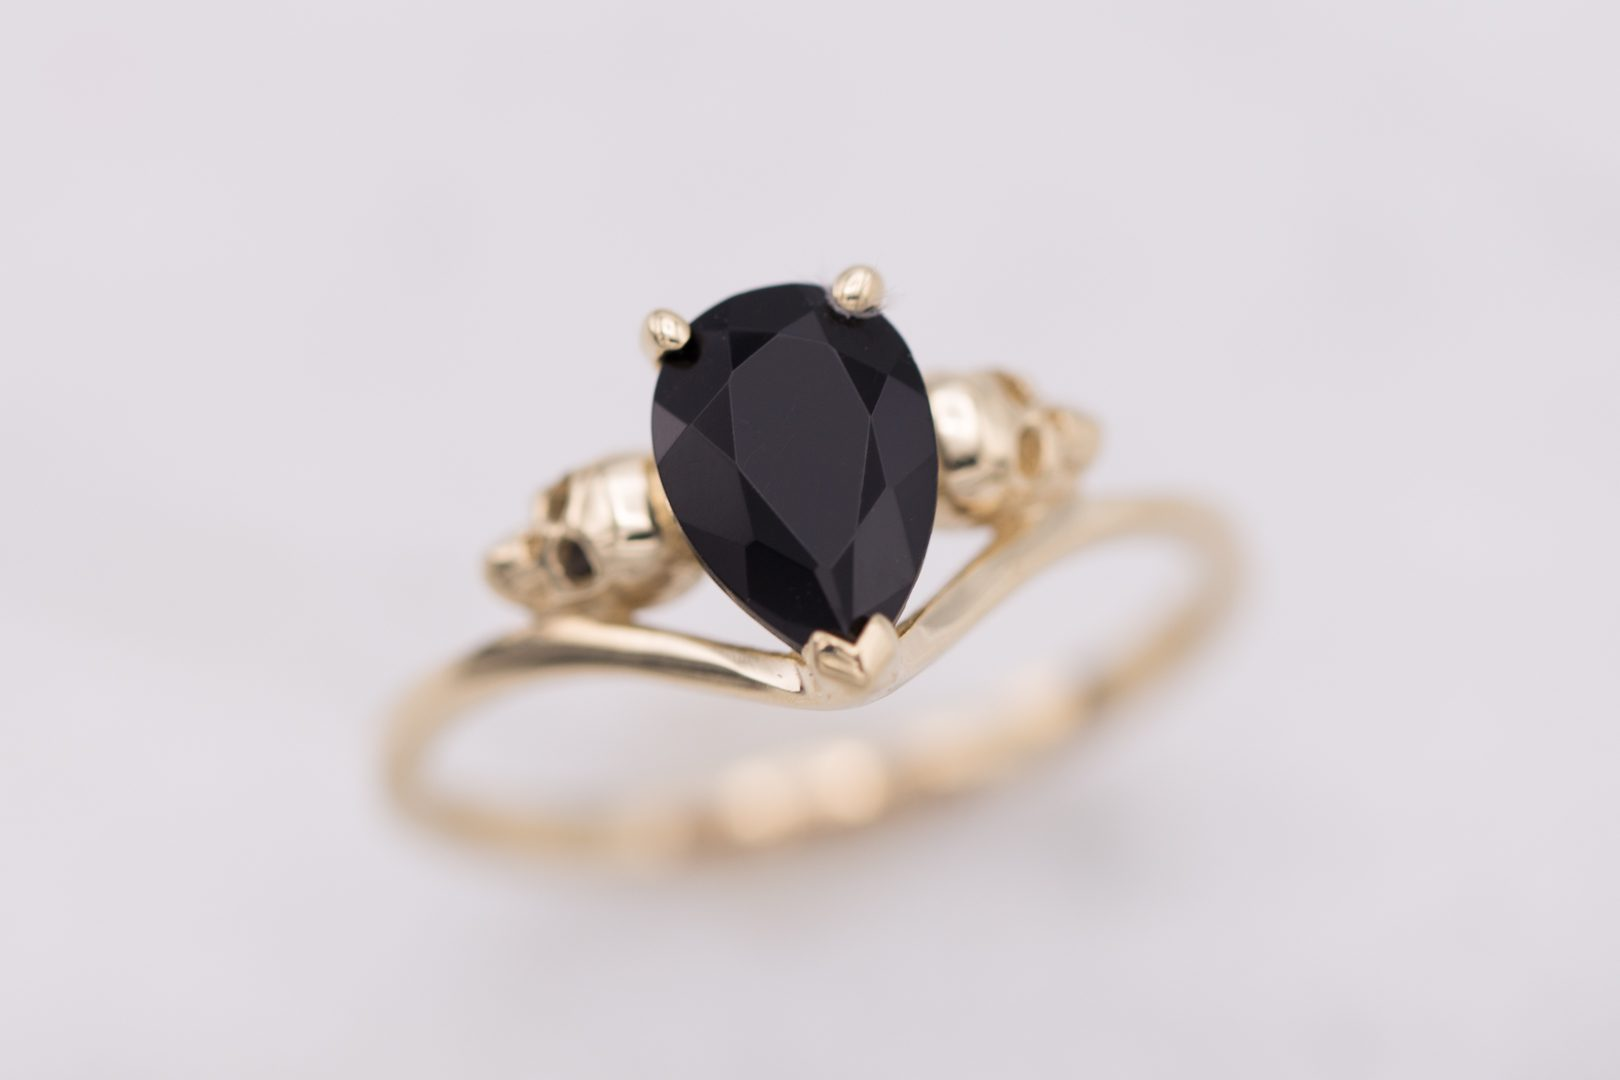 Onyx Value Price And Jewelry Information International Gem Society